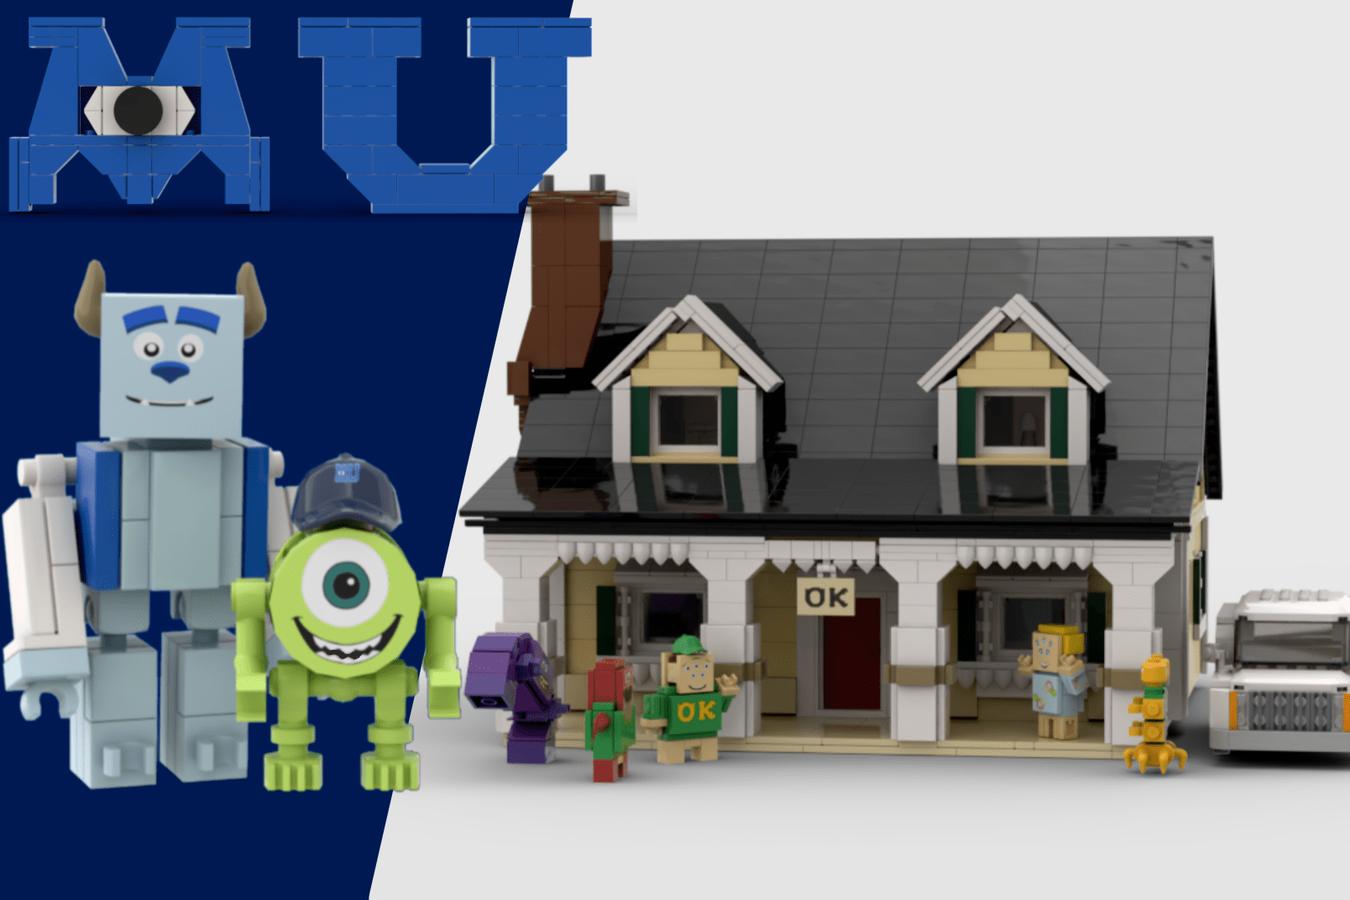 Lego Ideas Monsters University Oozma Kappa Fraternity House